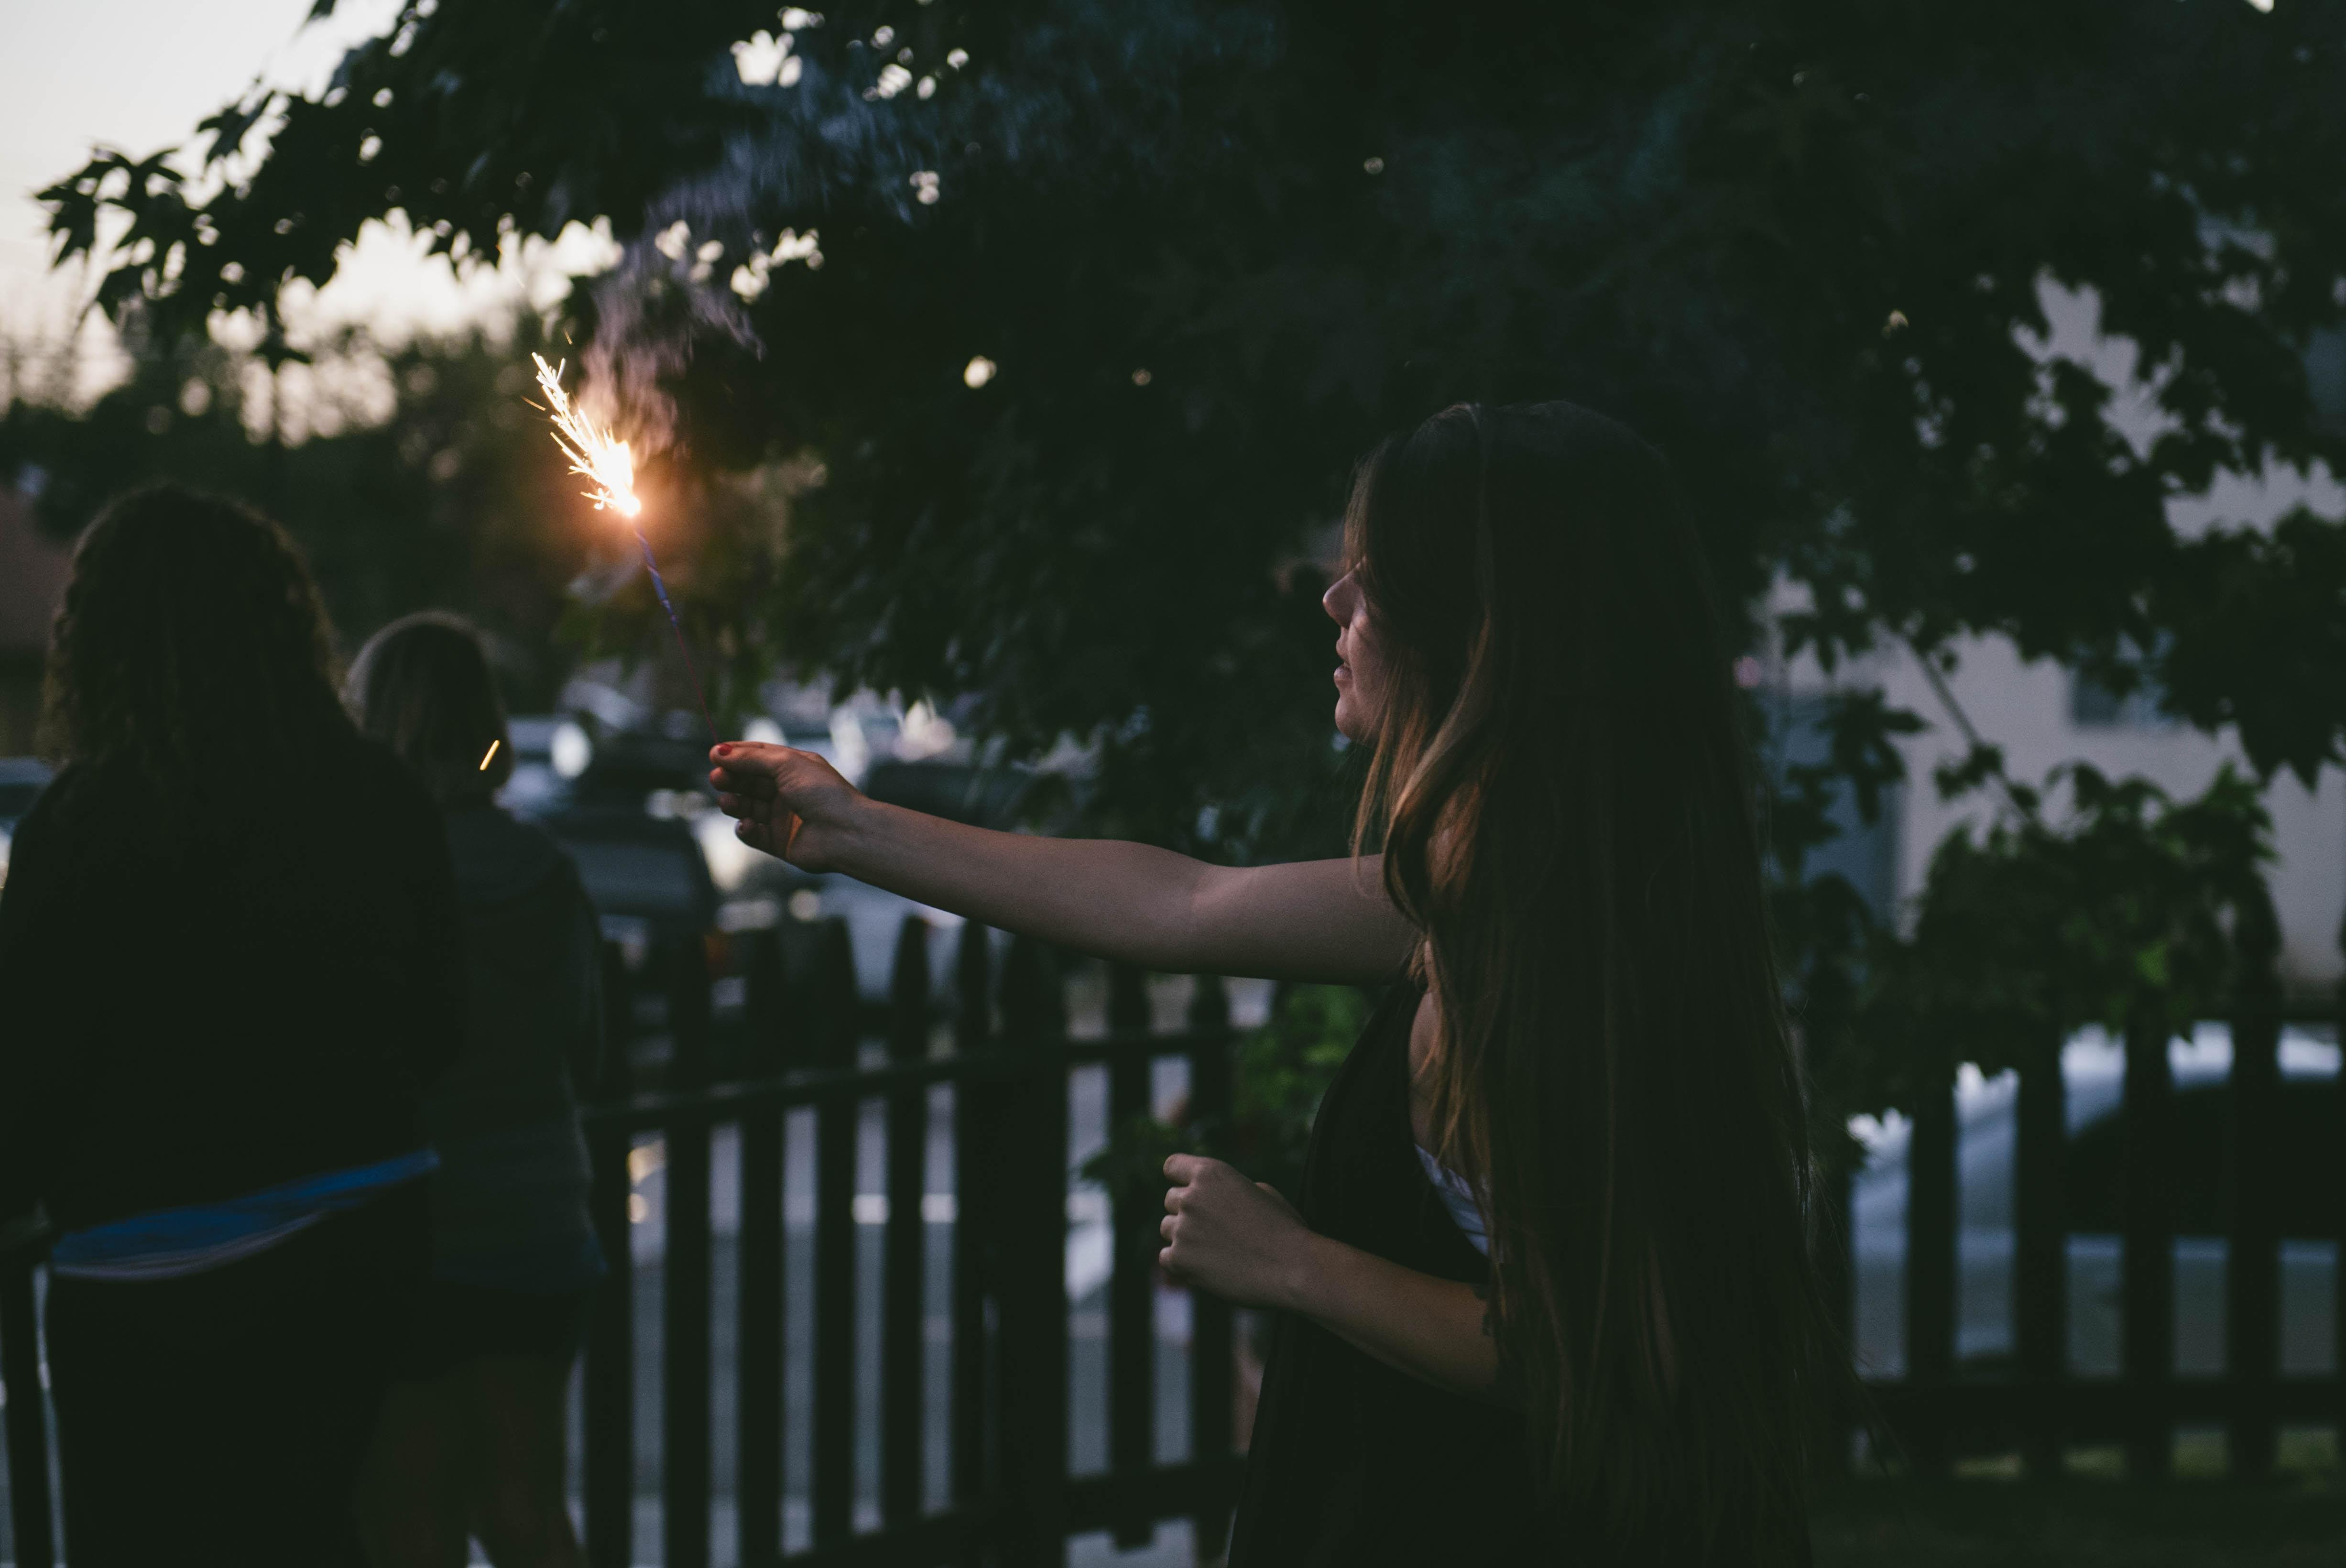 woman holding sparkler near fence